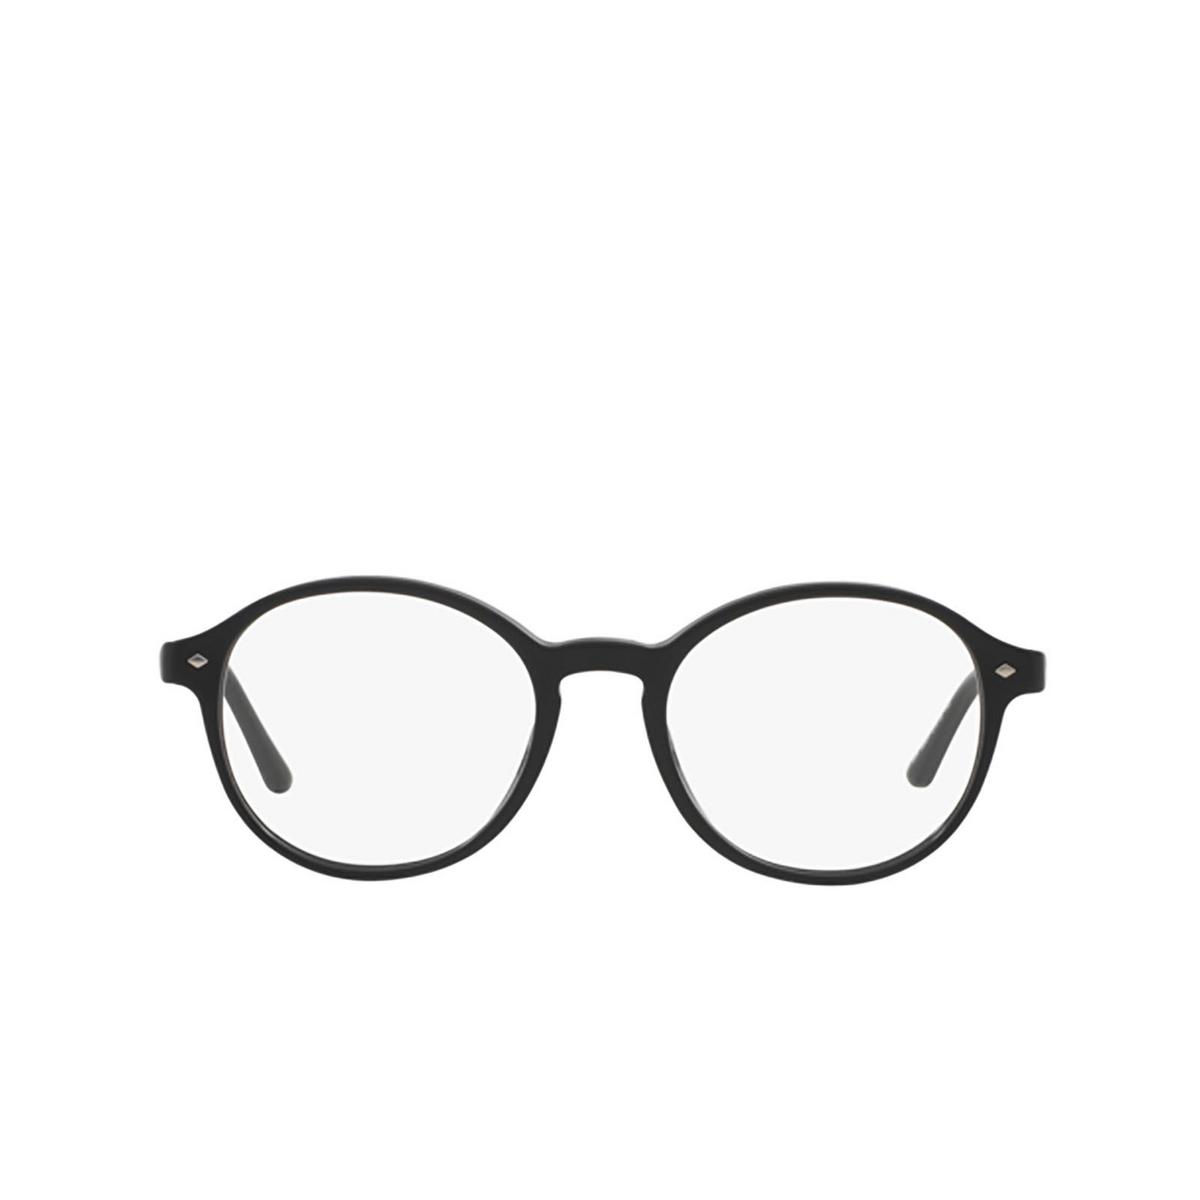 Giorgio Armani® Round Eyeglasses: AR7004 color Top Matte Black / Shiny 5001 - front view.